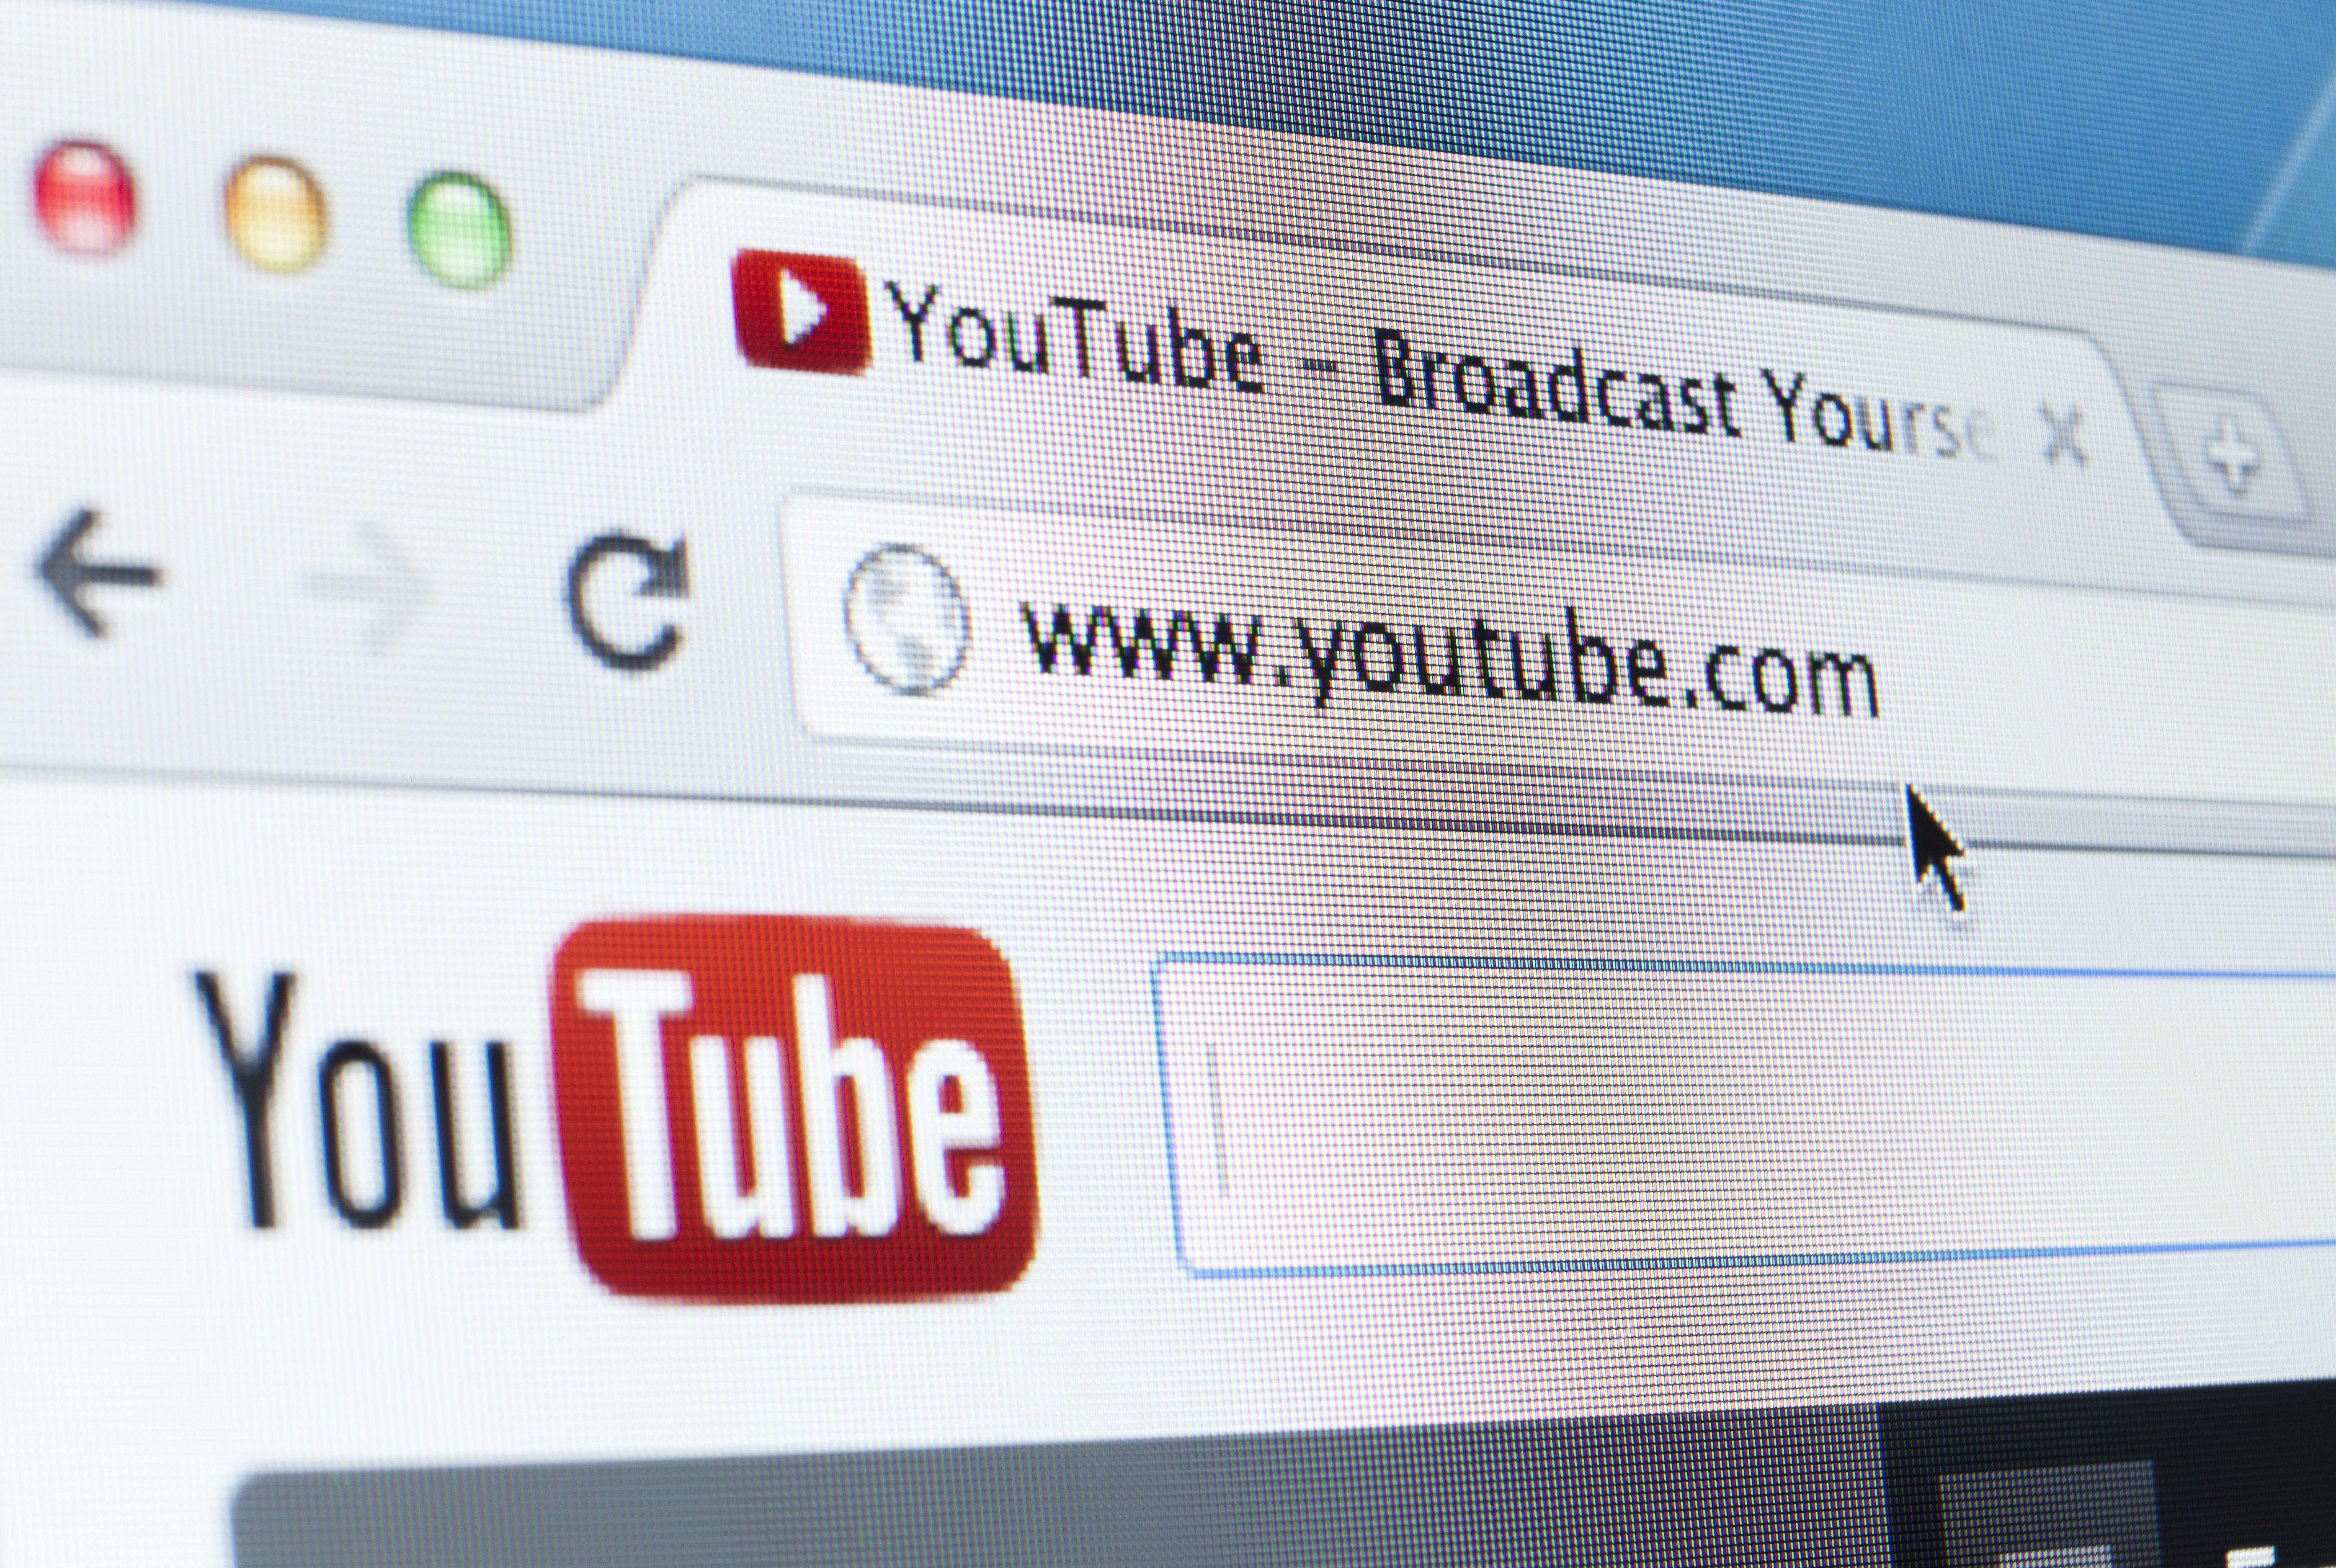 YouTube Bans Dangerous Pranks And Stunts In Wake Of 'Bird Box'